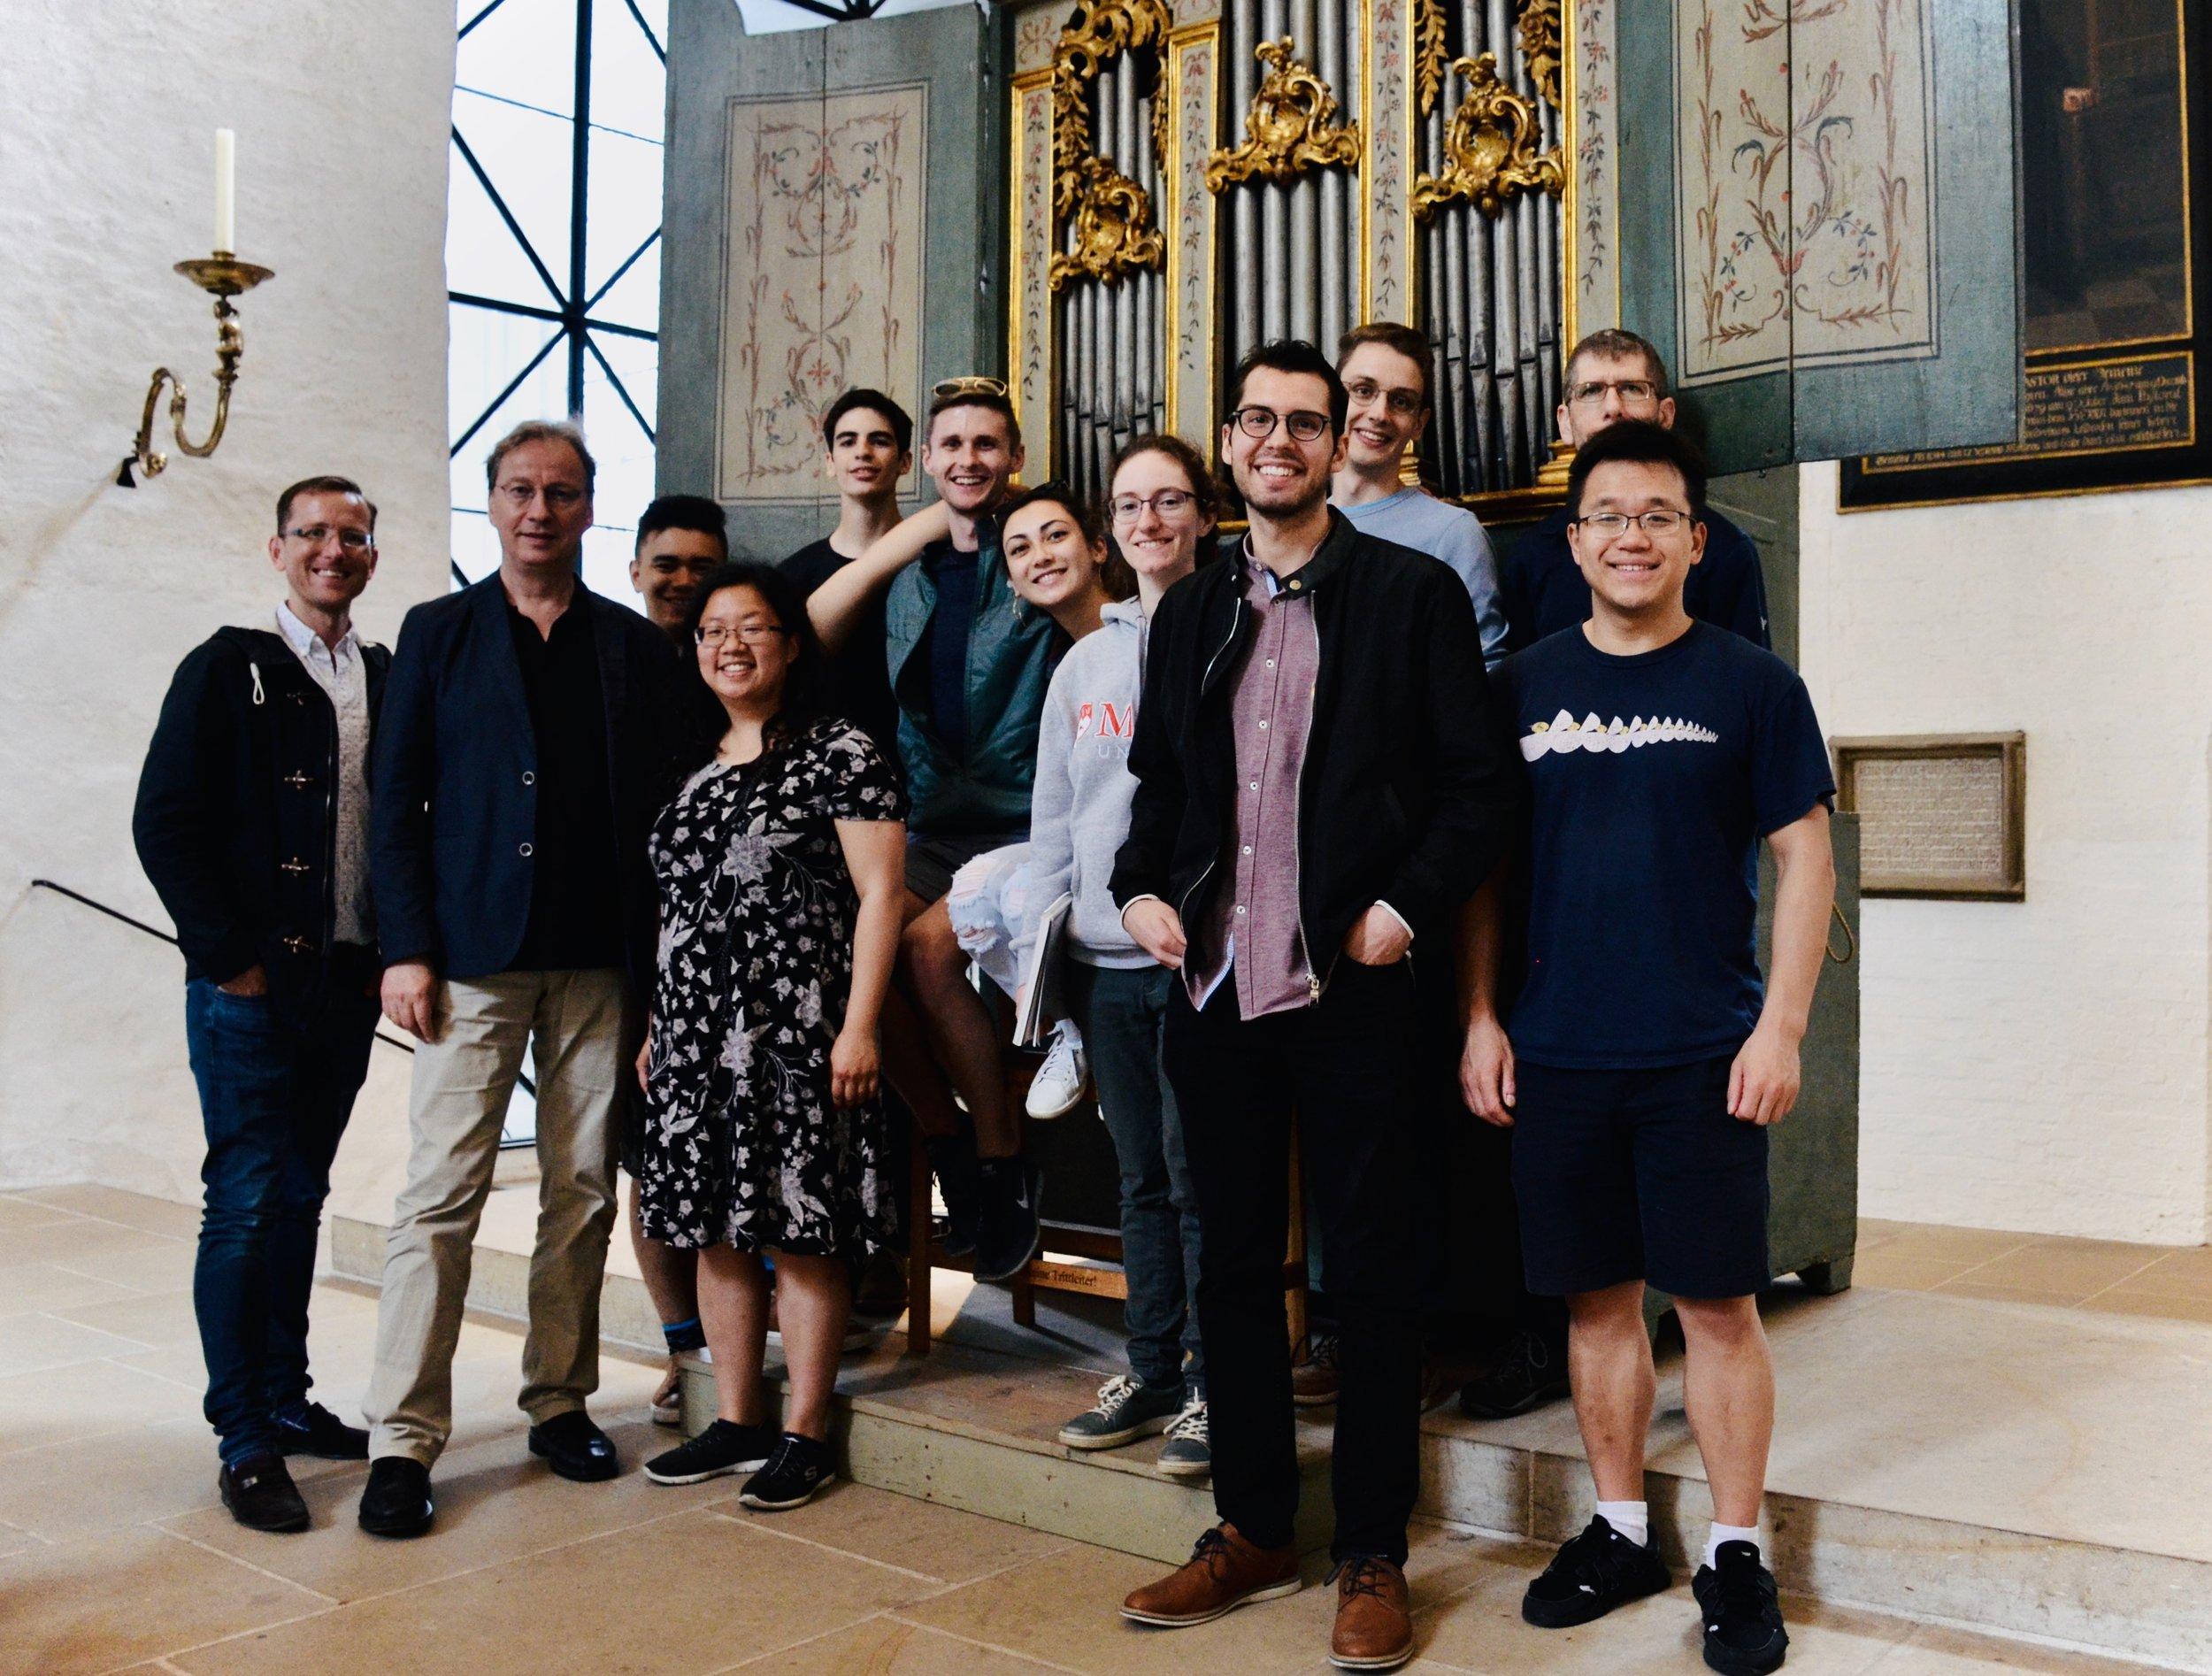 Members of Boston Organ Studio with Prof. Arvid Gast, 1777 Italian Baroque organ in Lübeck Dom.